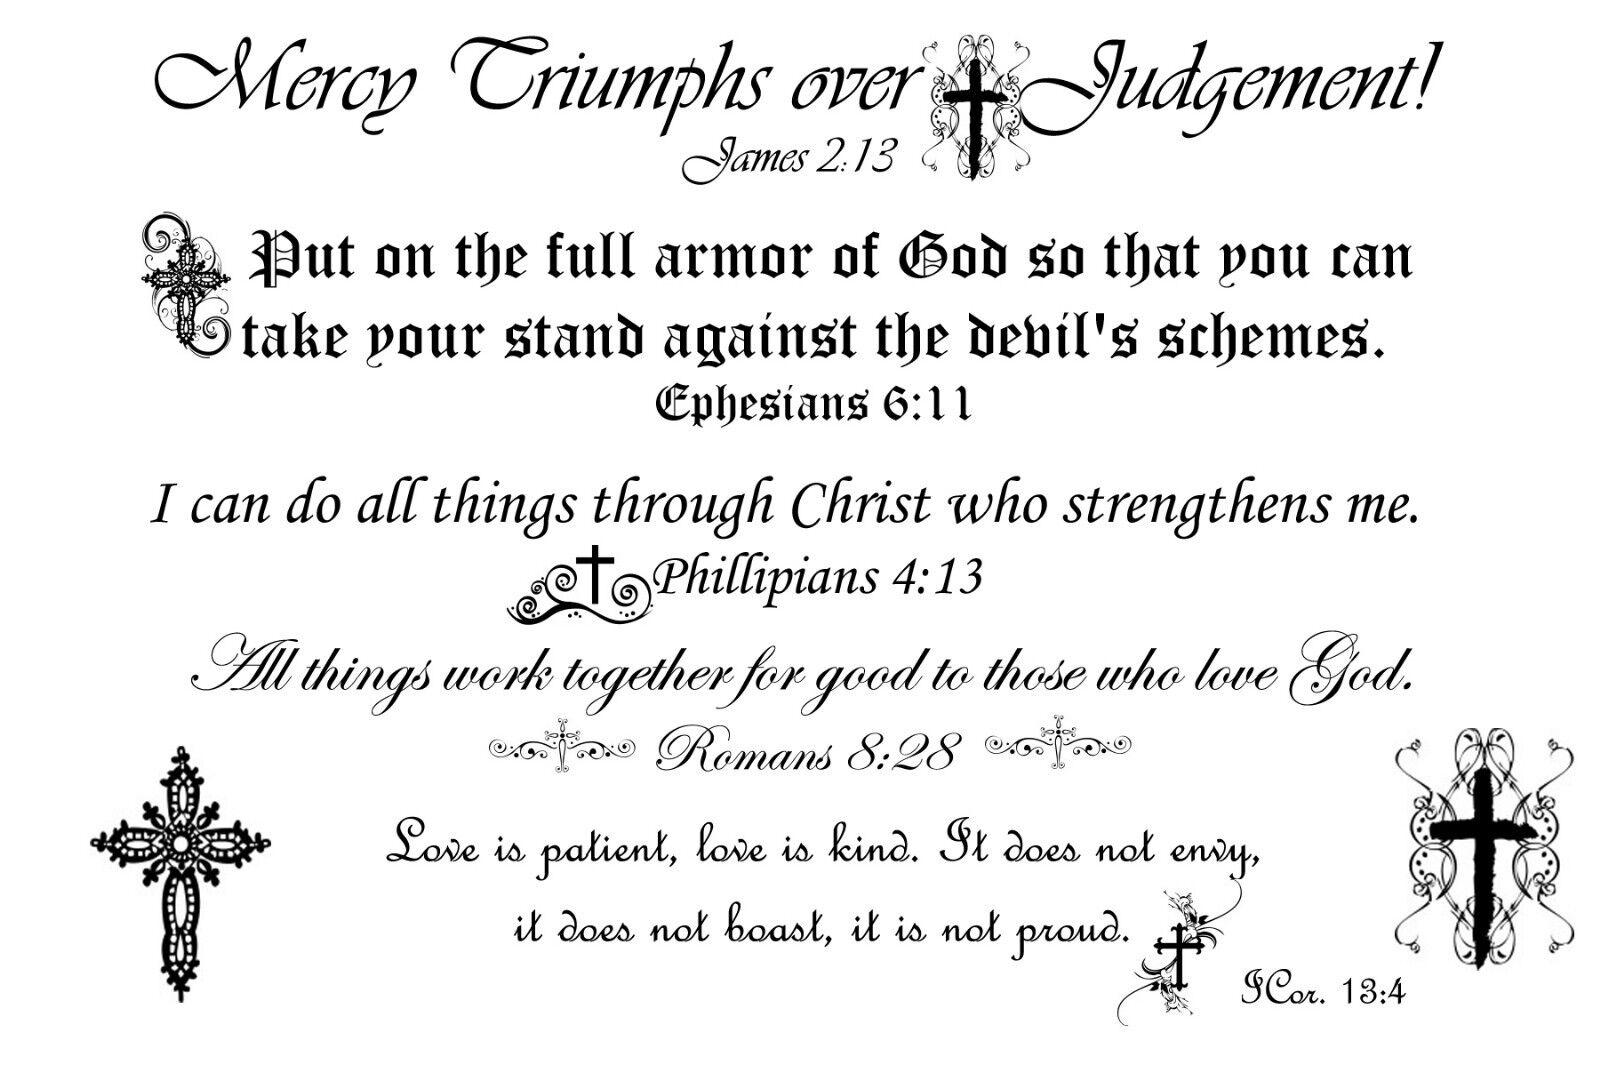 как выглядит Bible Verse Temporary Tattoos / Scripture Tattoos 3-Pack Bundle фото